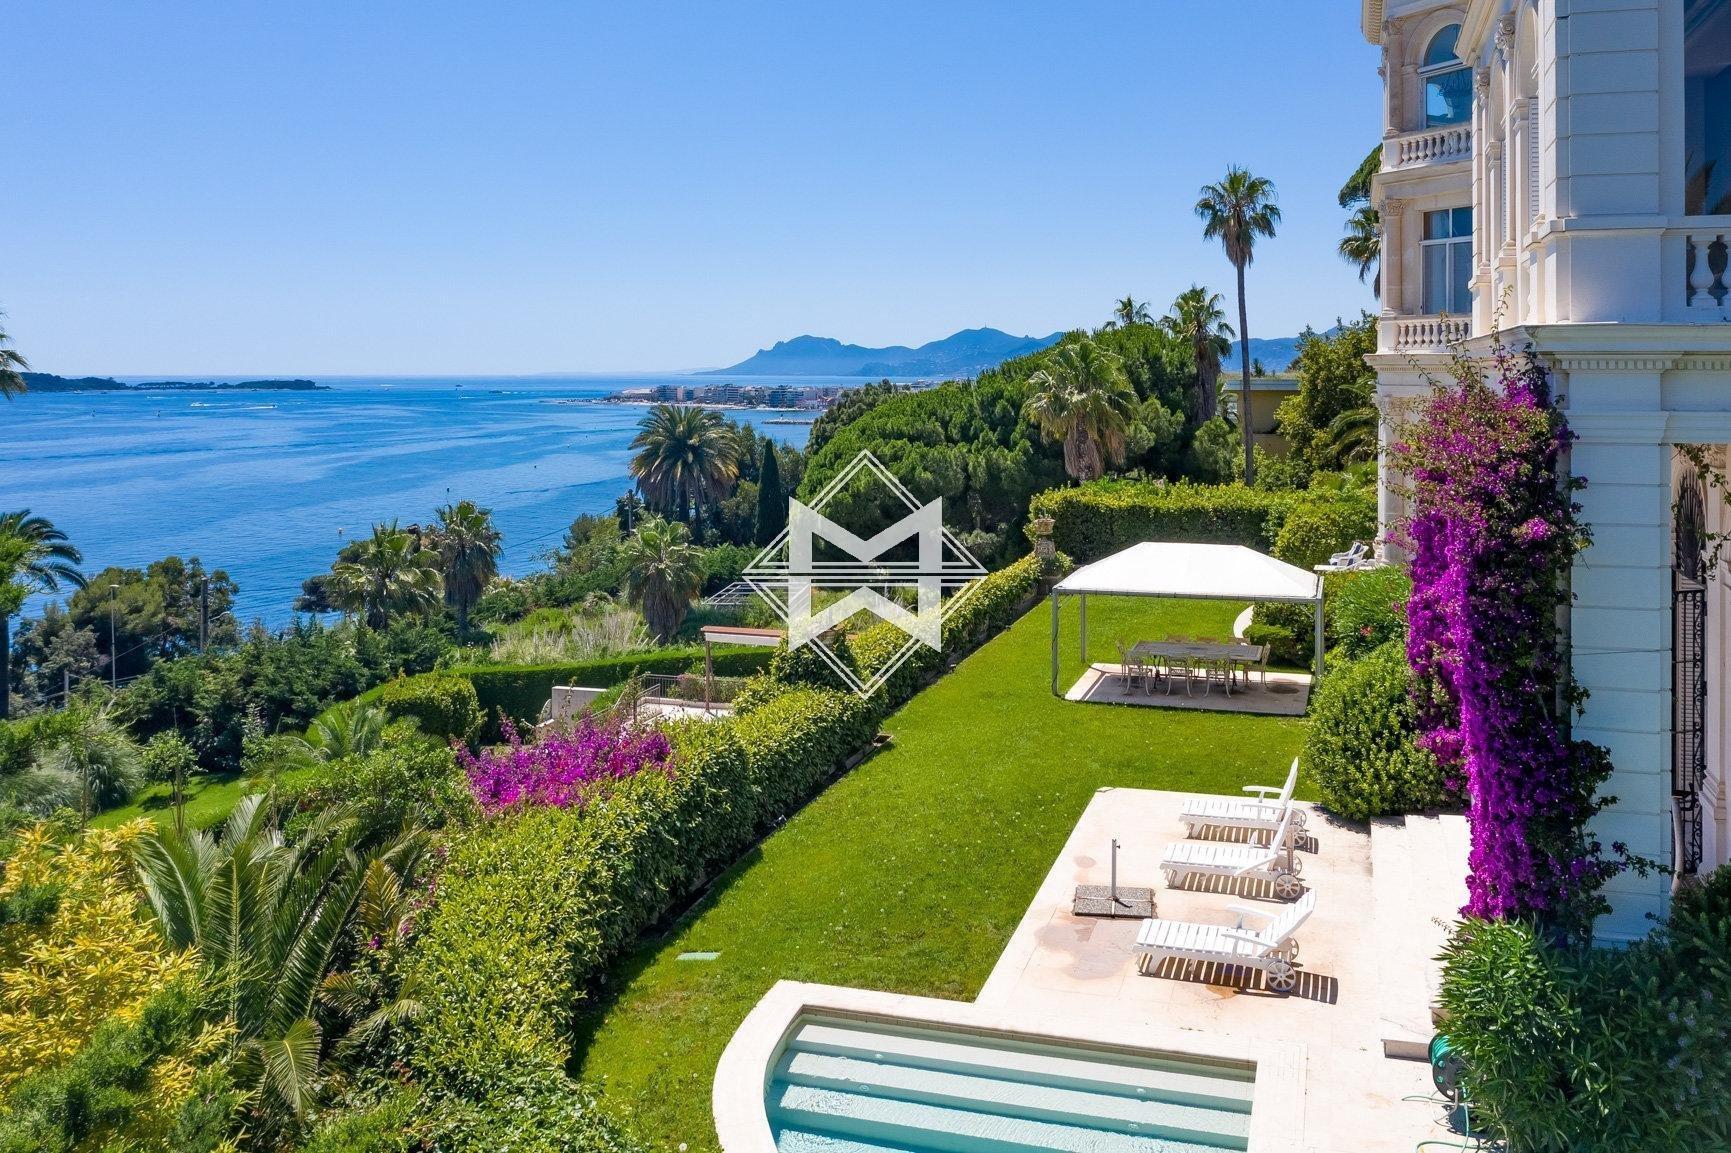 Apartment in Cannes, Provence-Alpes-Côte d'Azur, France 1 - 11035525